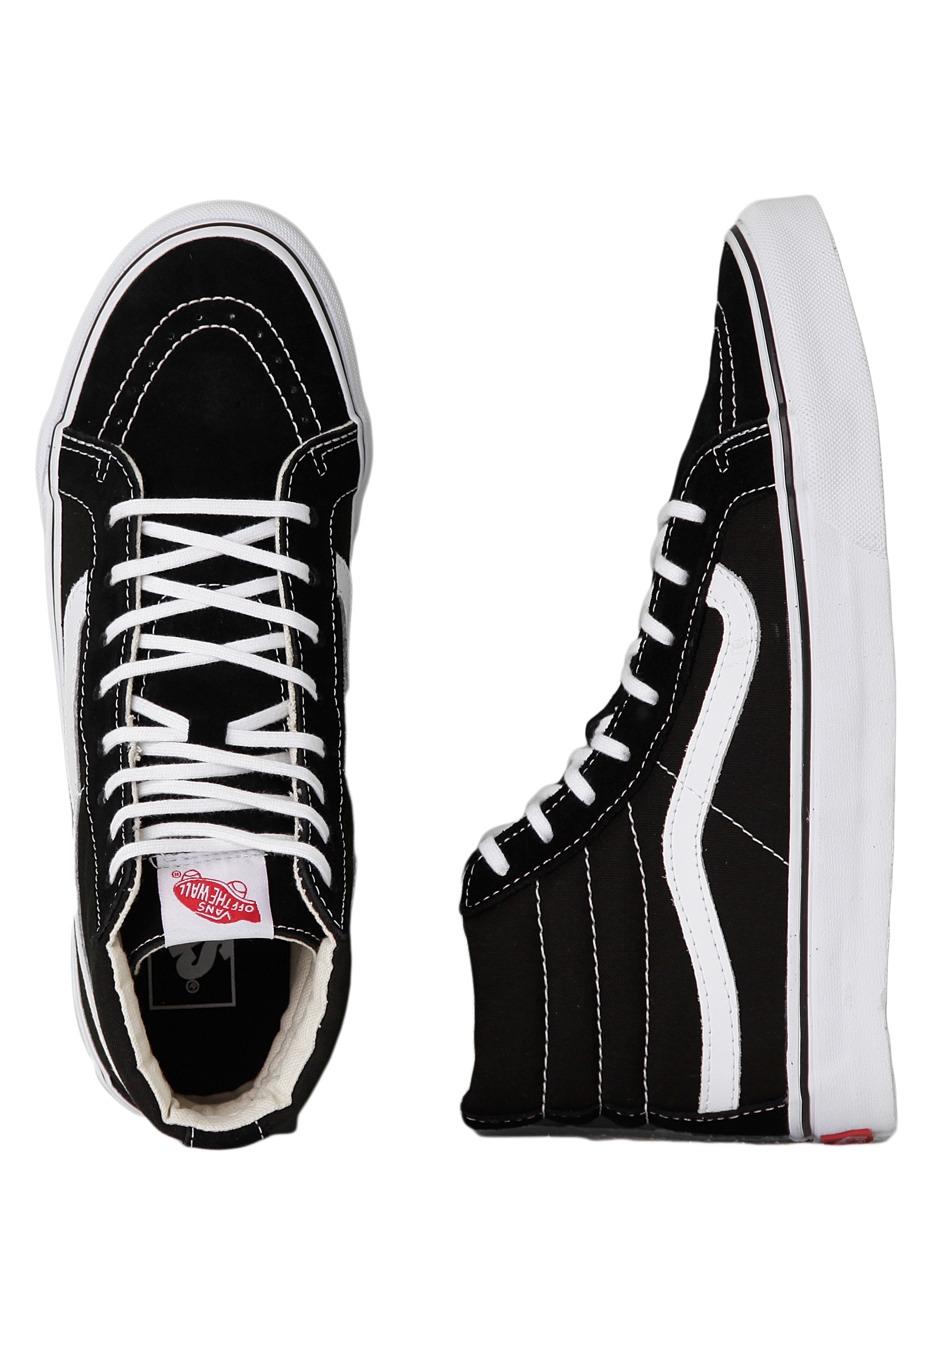 Vans - SK8-Hi Slim Frost Black/True White - Girl Shoes - Impericon.com ...